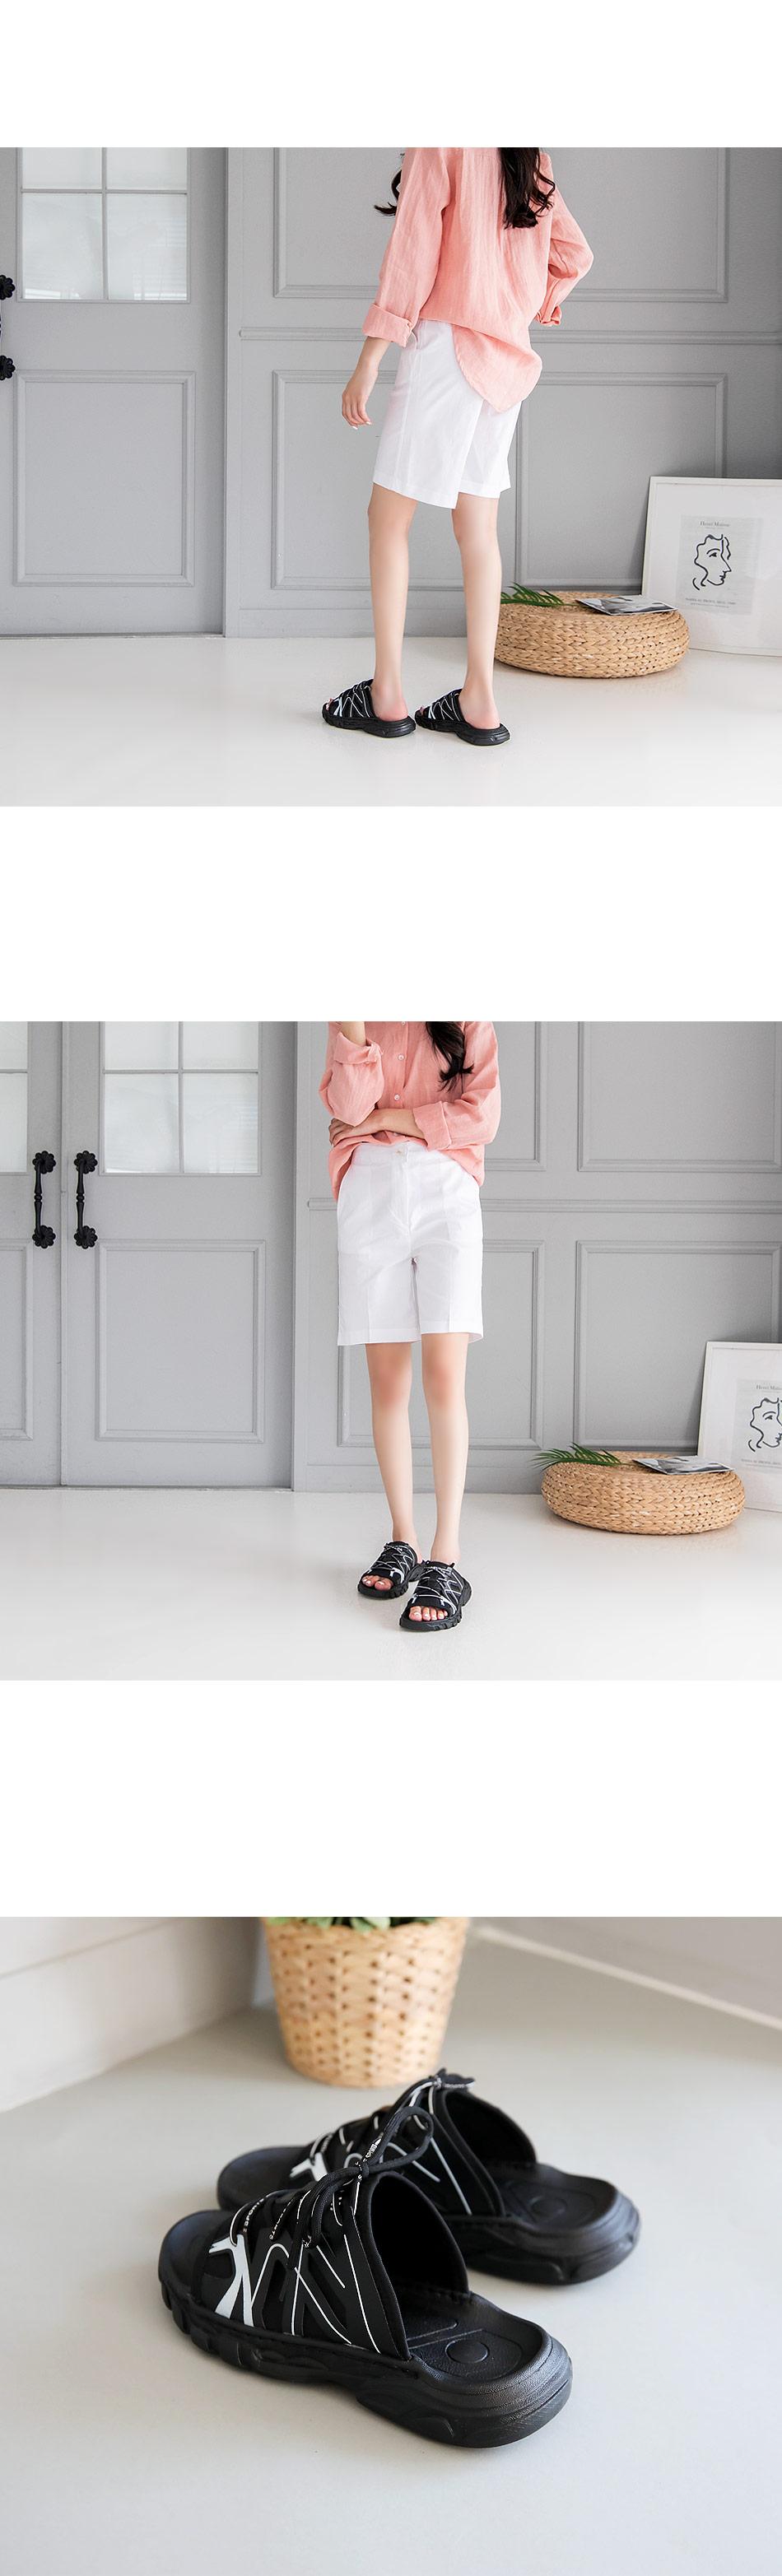 Tennis Slippers 3cm